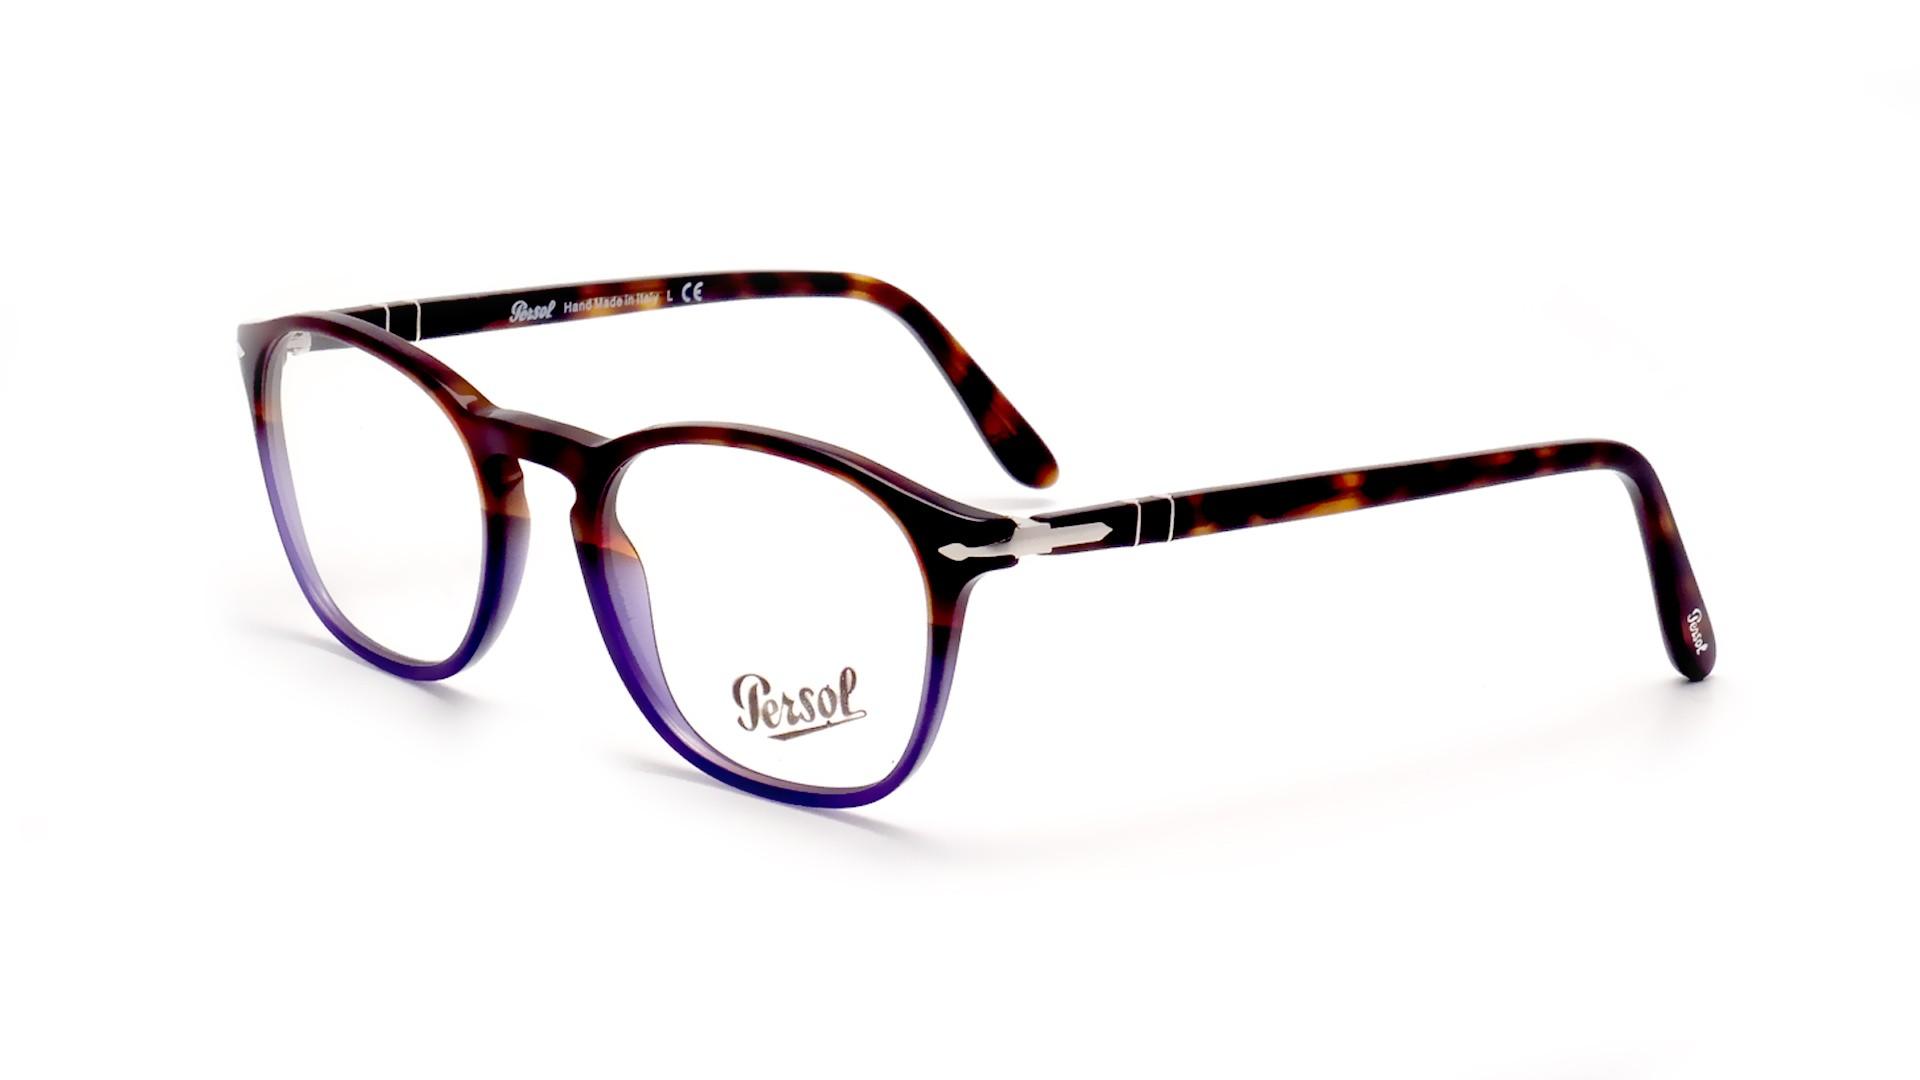 7e31d3a0aa Eyeglasses Persol Vintage Celebration Suprema Multicolor PO3007V 1022 50-19  Medium